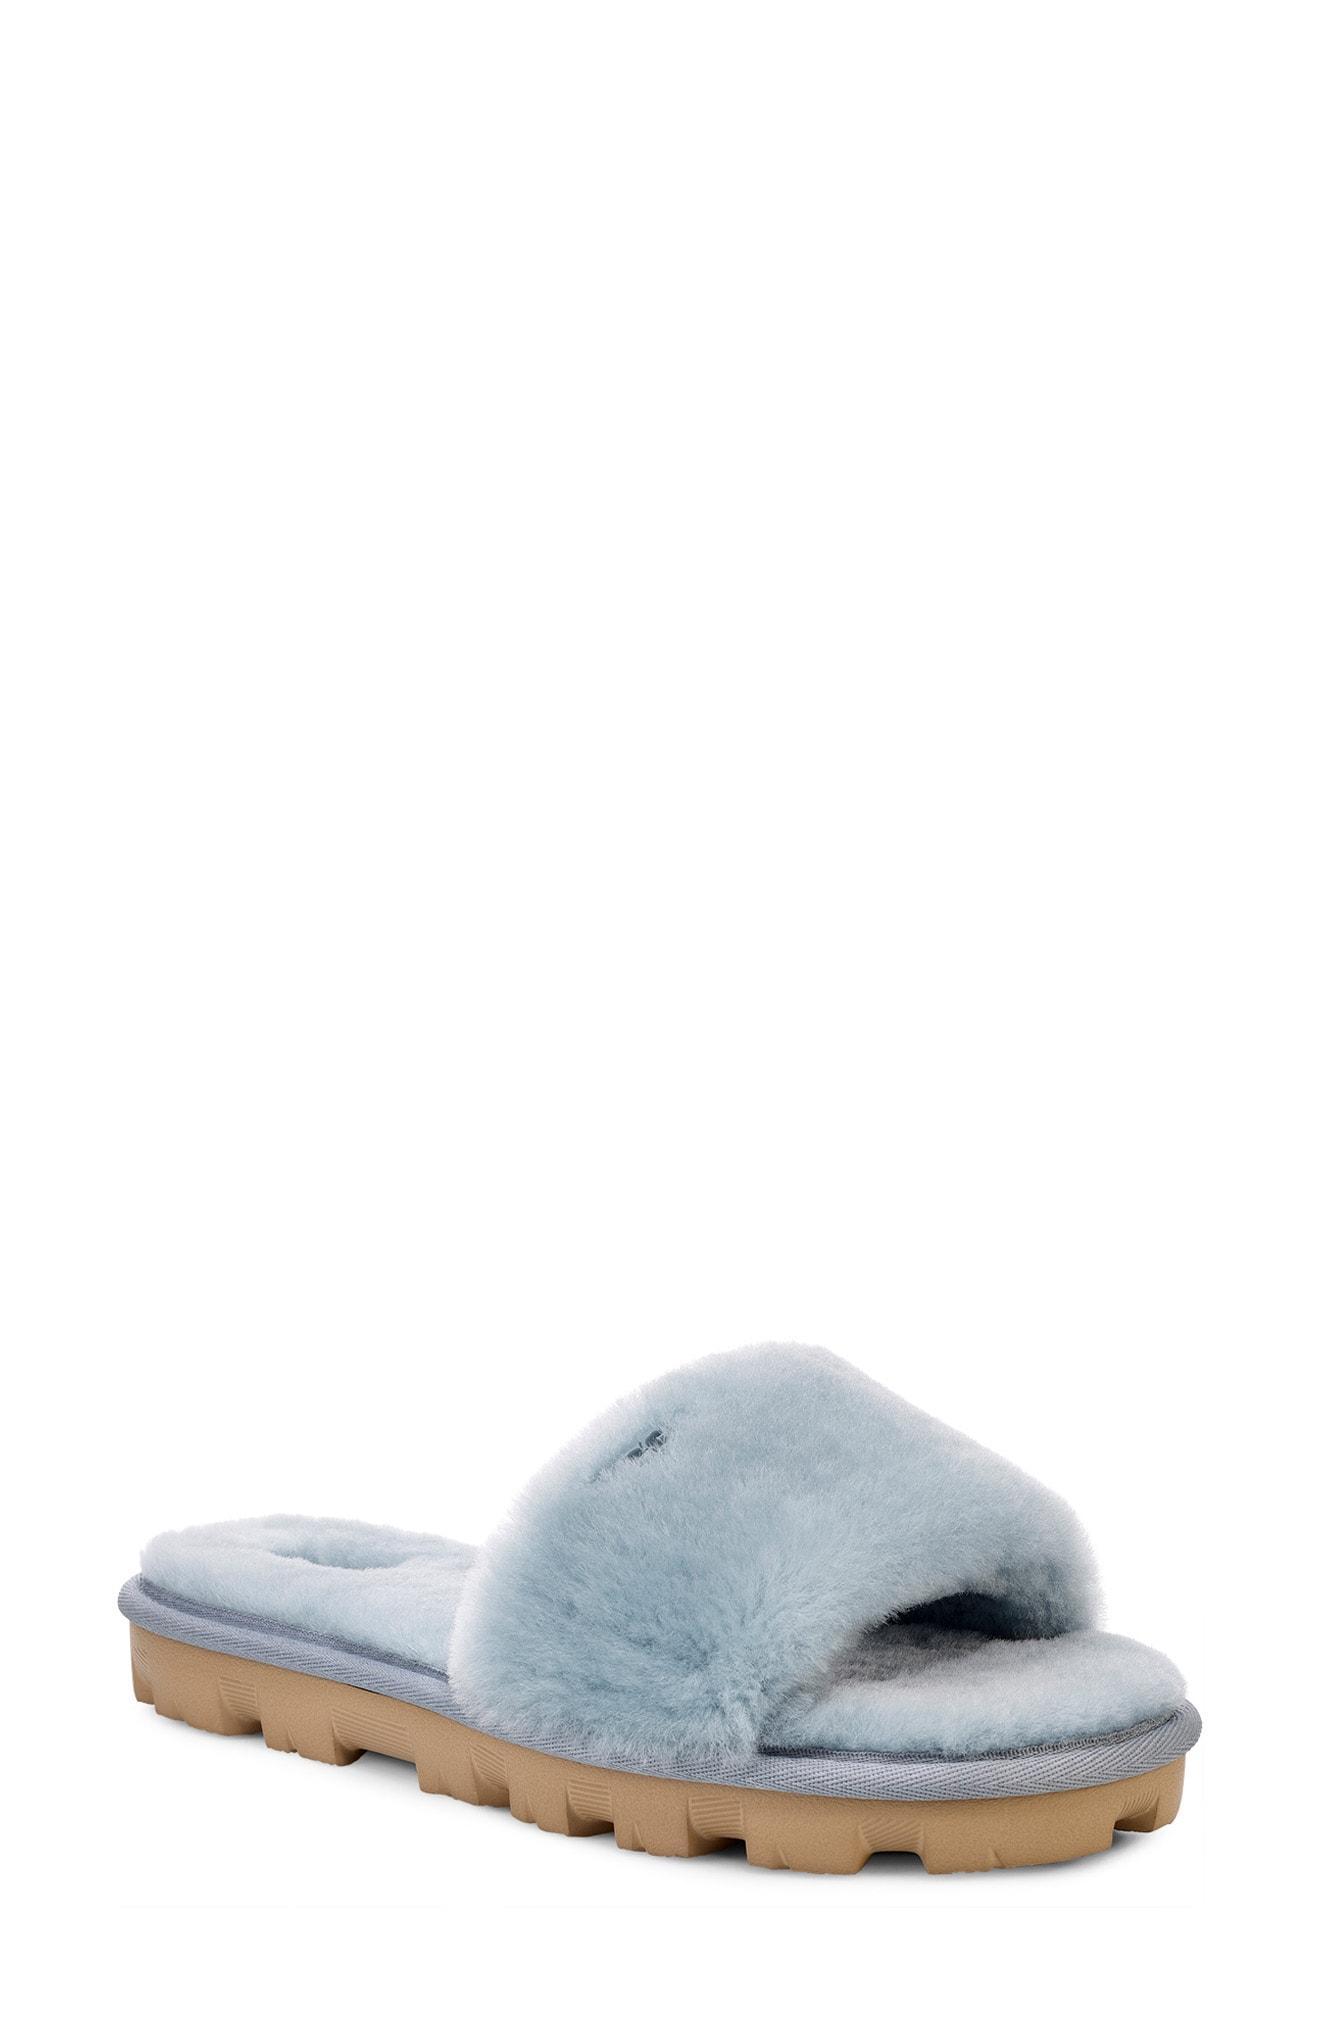 5a35e2870 UGG. Women's Ugg Cozette Genuine Shearling Slipper